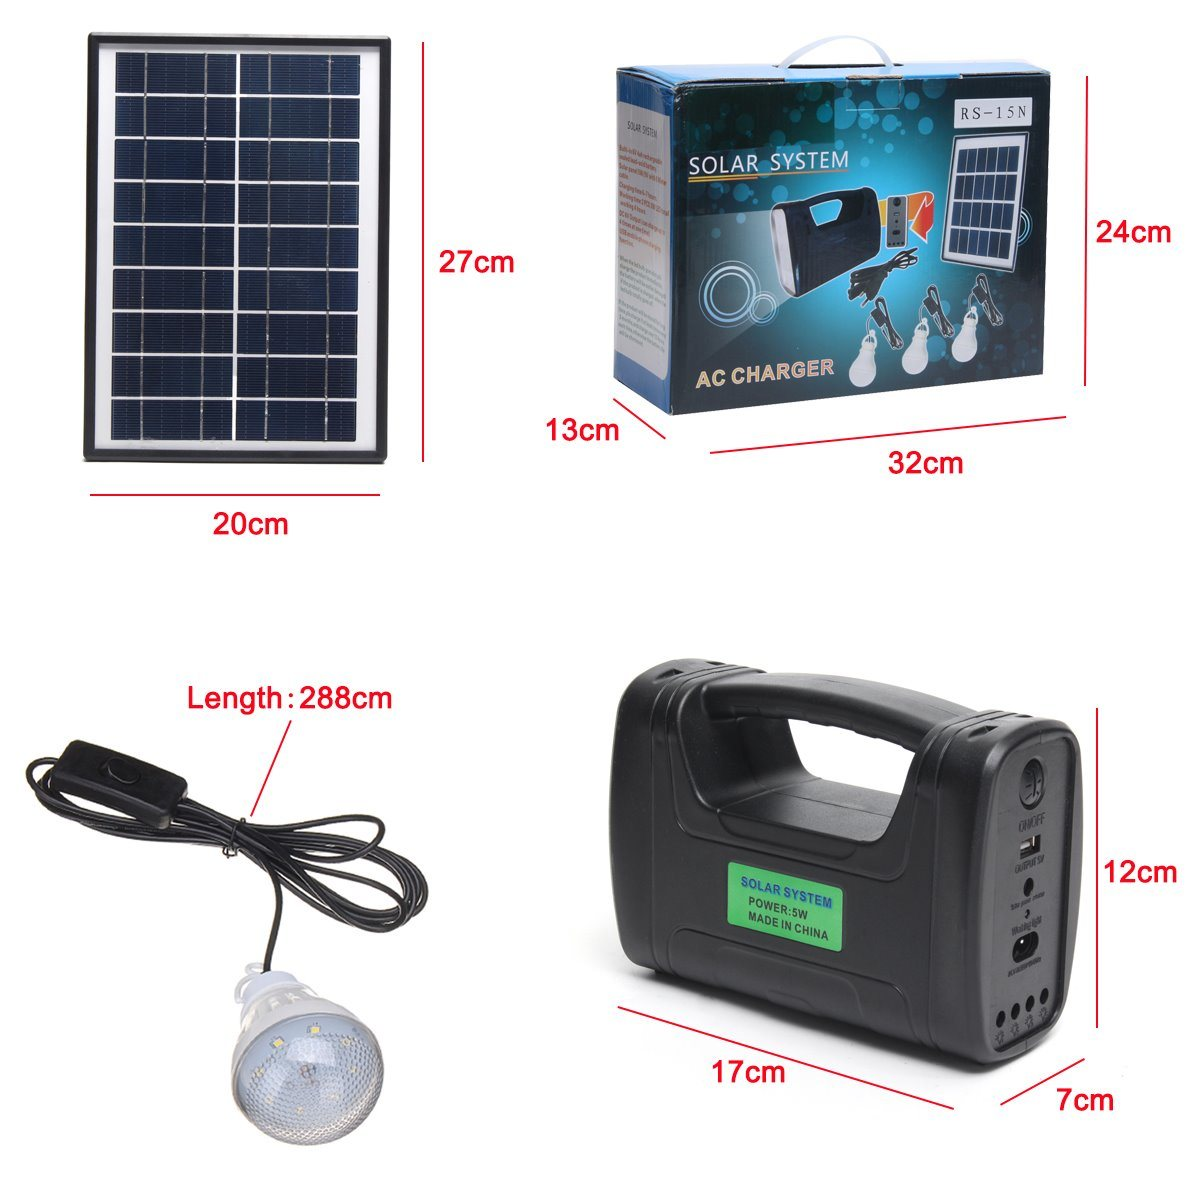 China 2018 solar panel generator light solar indoor light do it 2018 solar panel generator light solar indoor light do it yourself solar kit 3w 4w 5w solar light3pcs solar lamp solutioingenieria Gallery